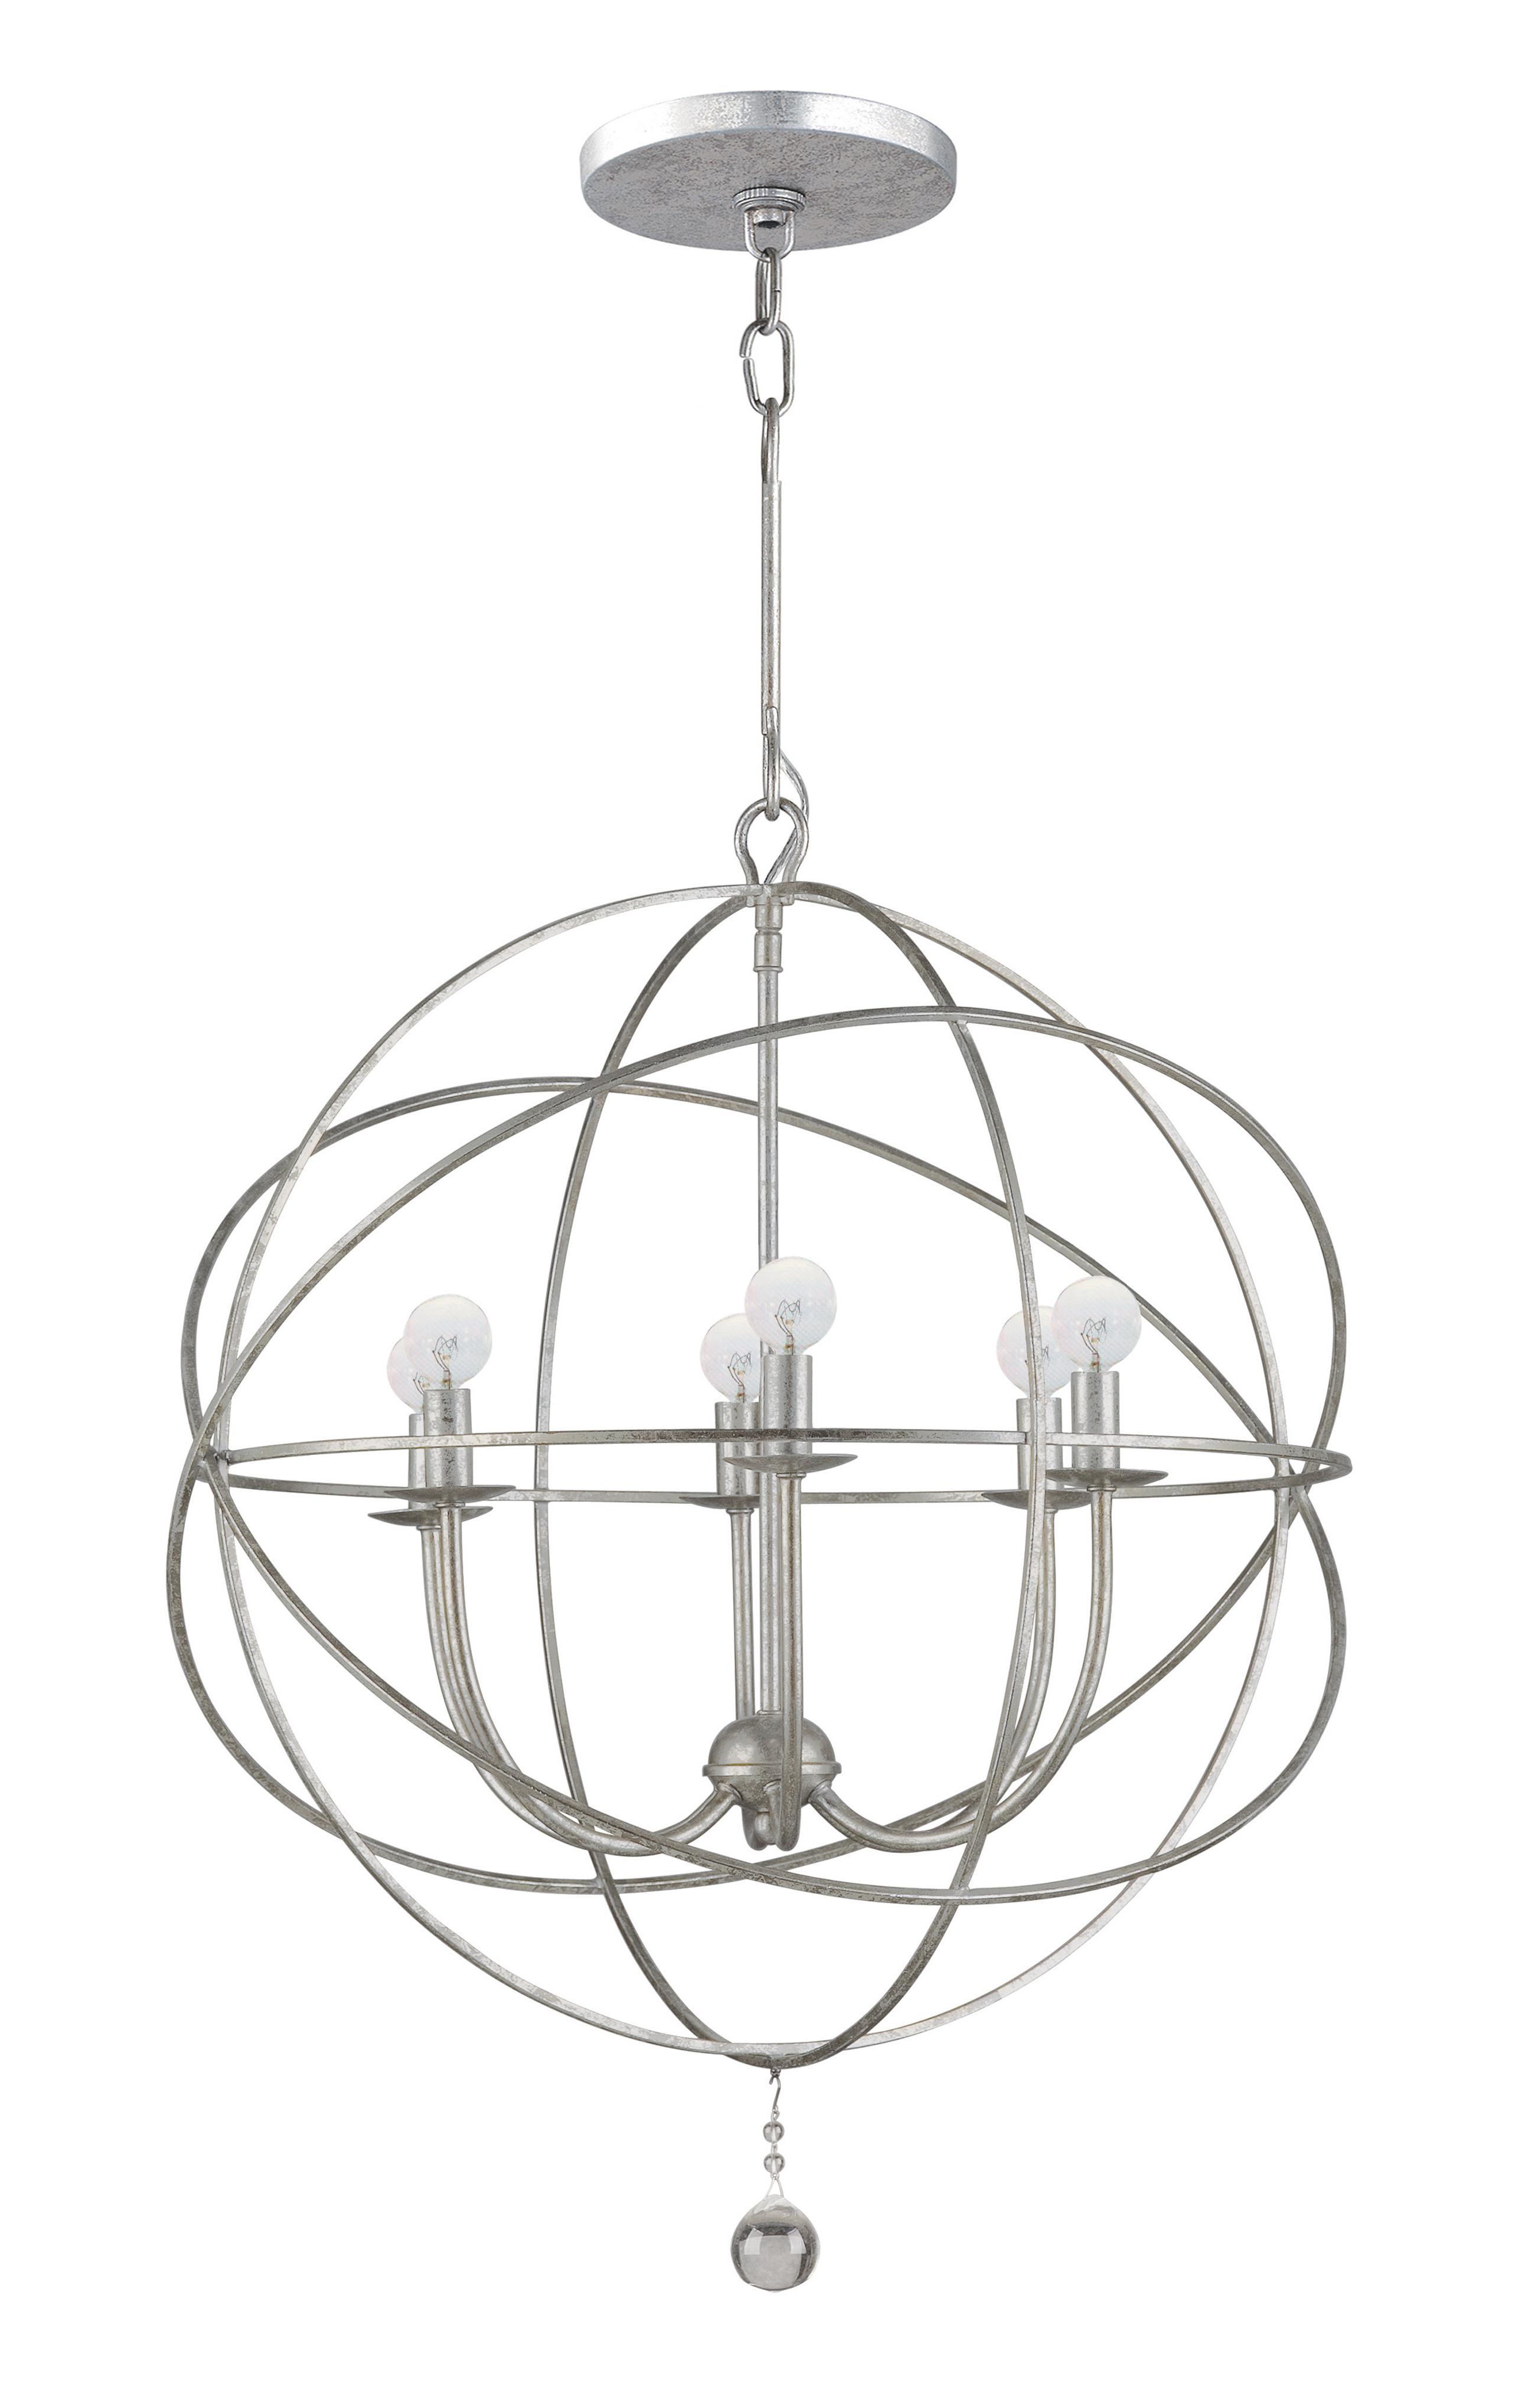 Recent Gregoire 6 Light Globe Chandelier With Regard To Eastbourne 6 Light Unique / Statement Chandeliers (View 18 of 20)